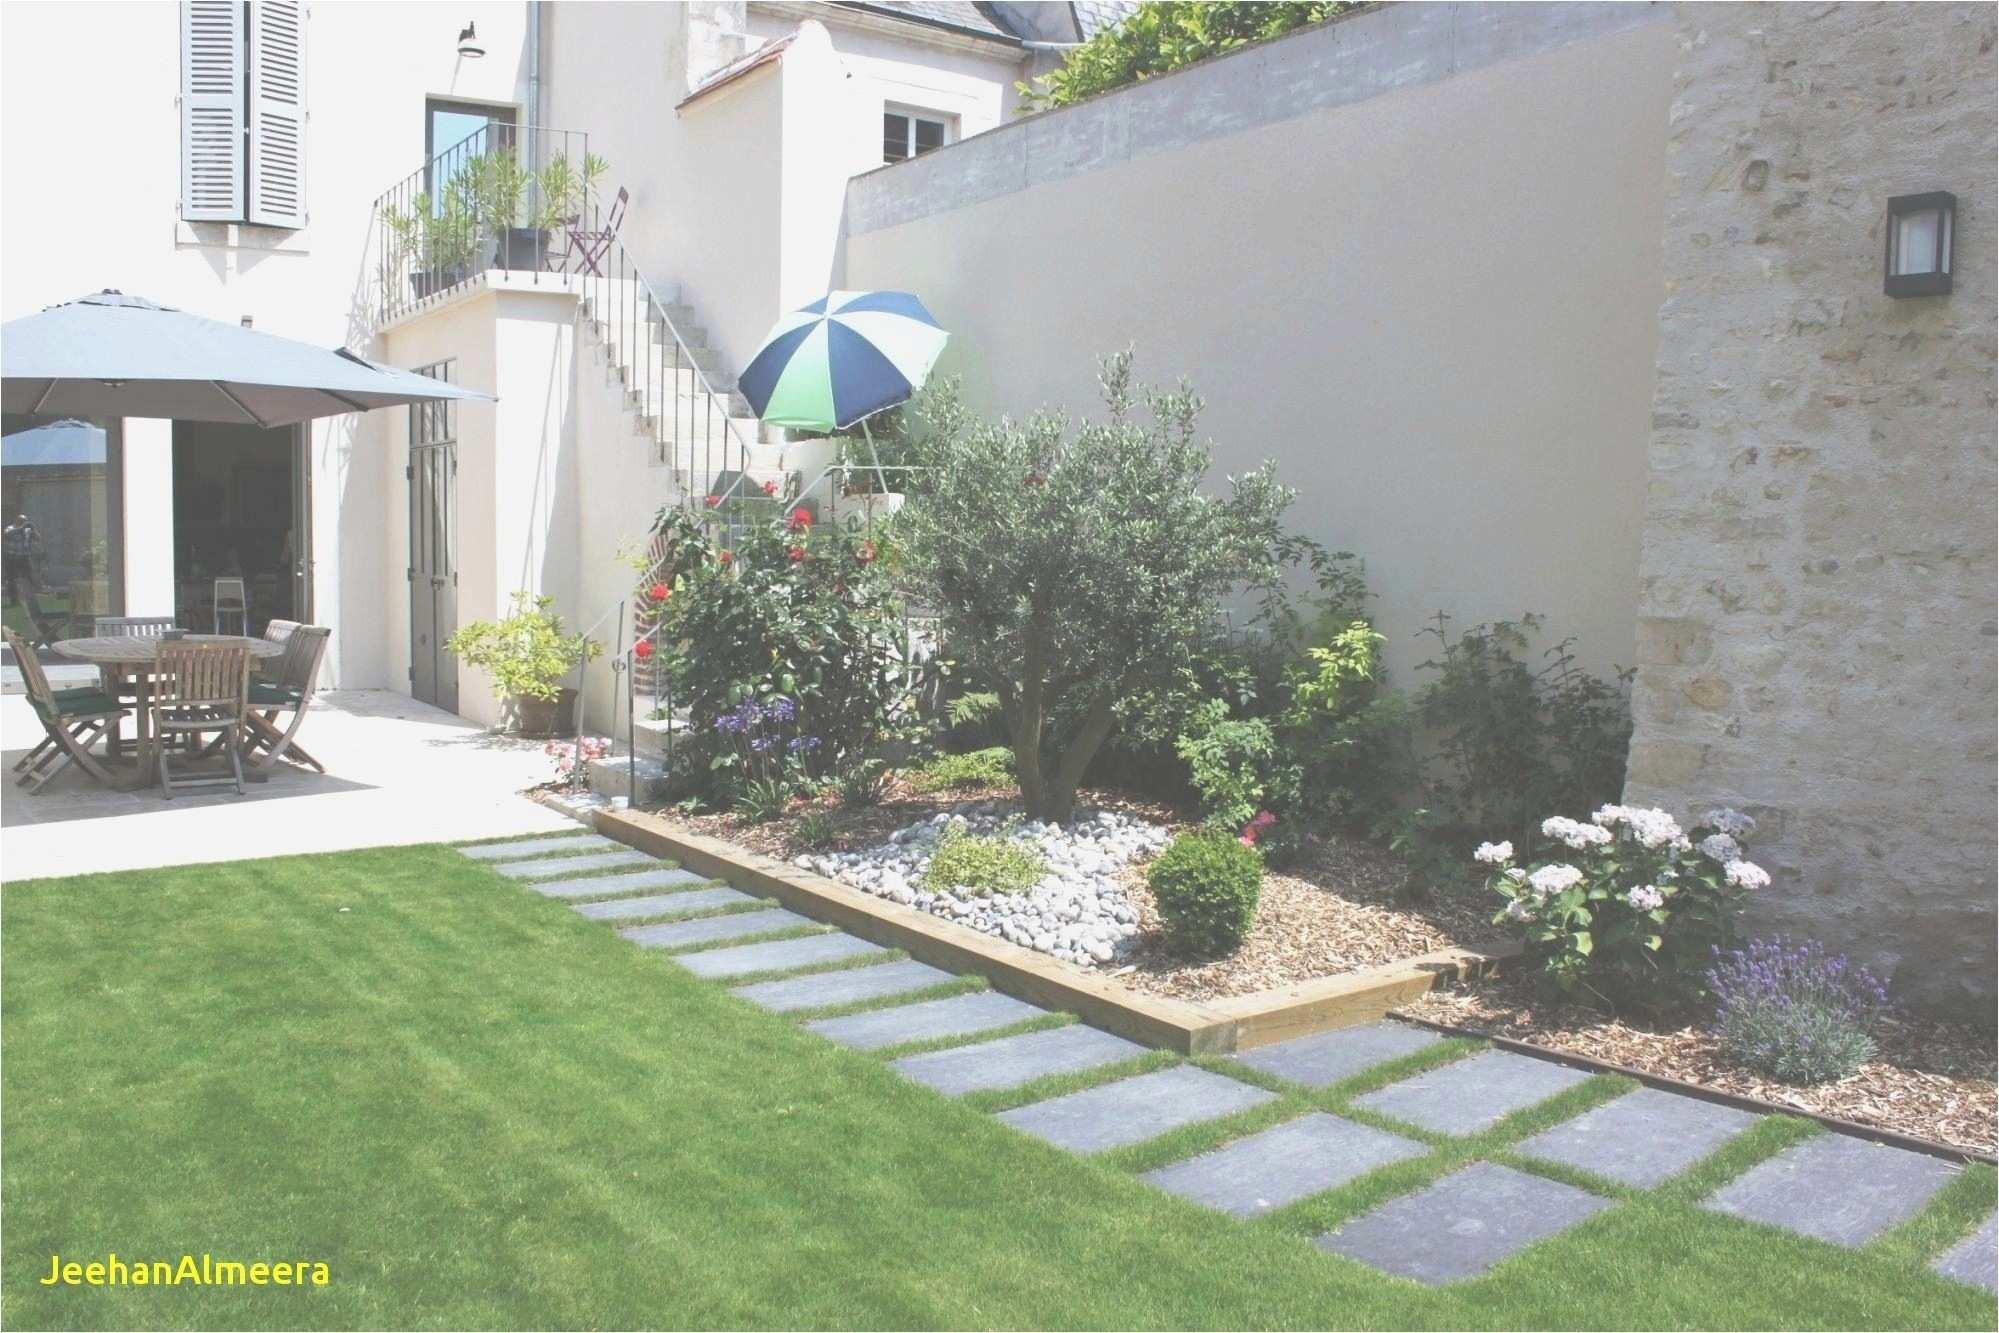 Logiciel Amenagement Jardin Gratuit Amenager son Jardin